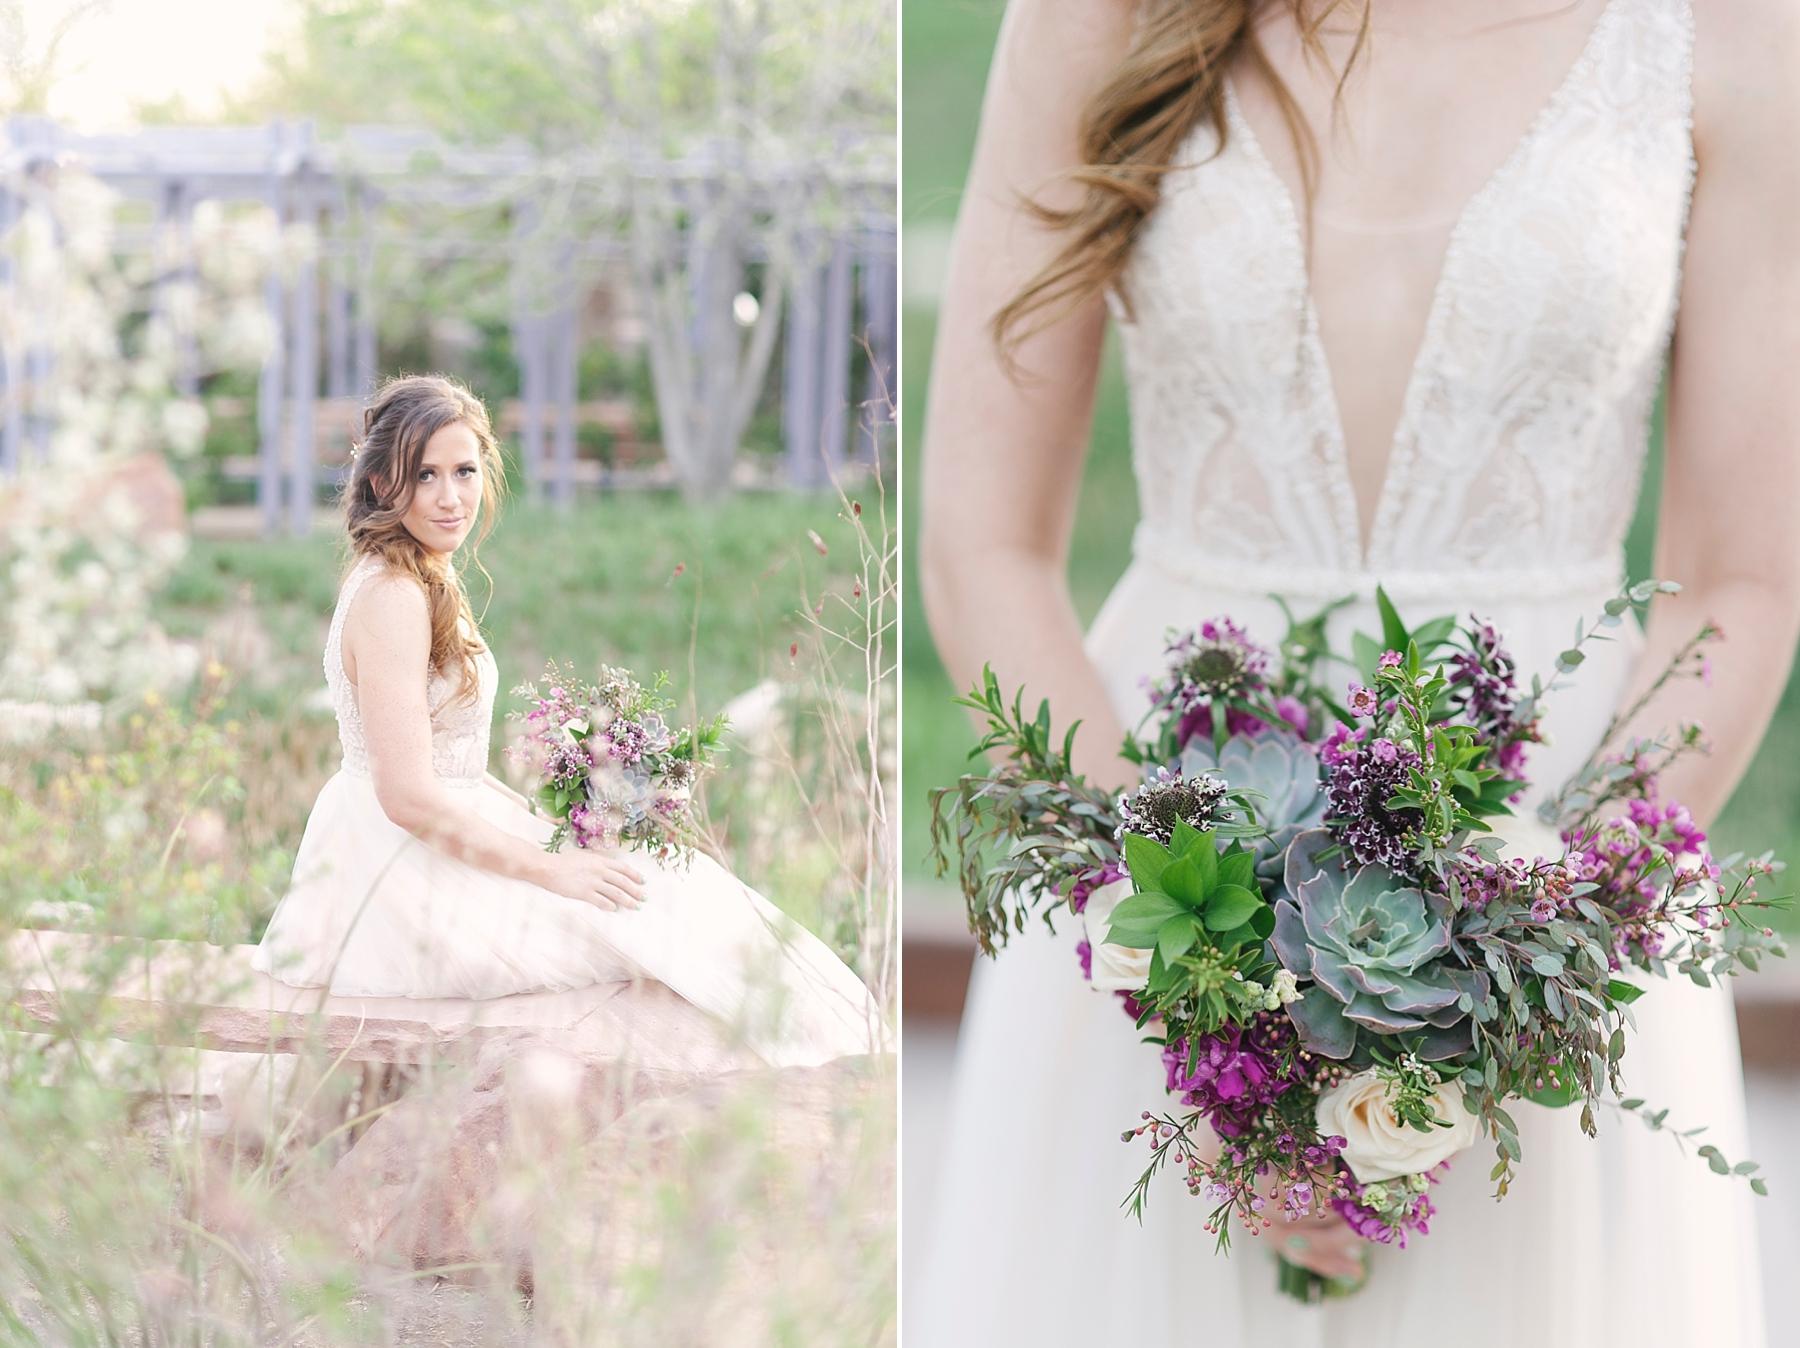 springs-preserve-wedding-las-vegas-destination-photography-the-emerics-33.jpg